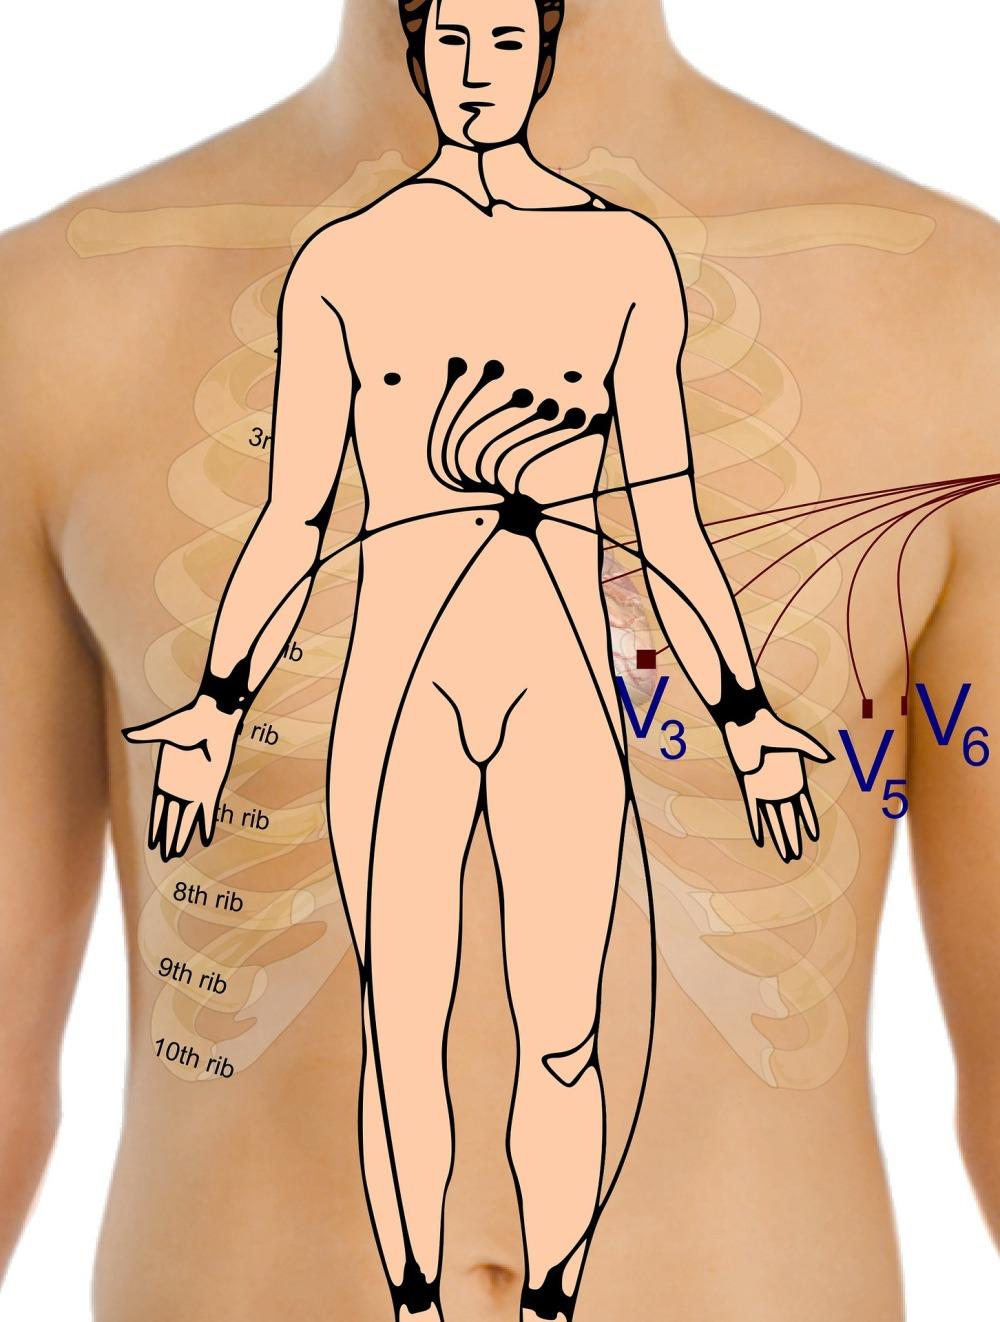 electrocardiogram-165962_1920